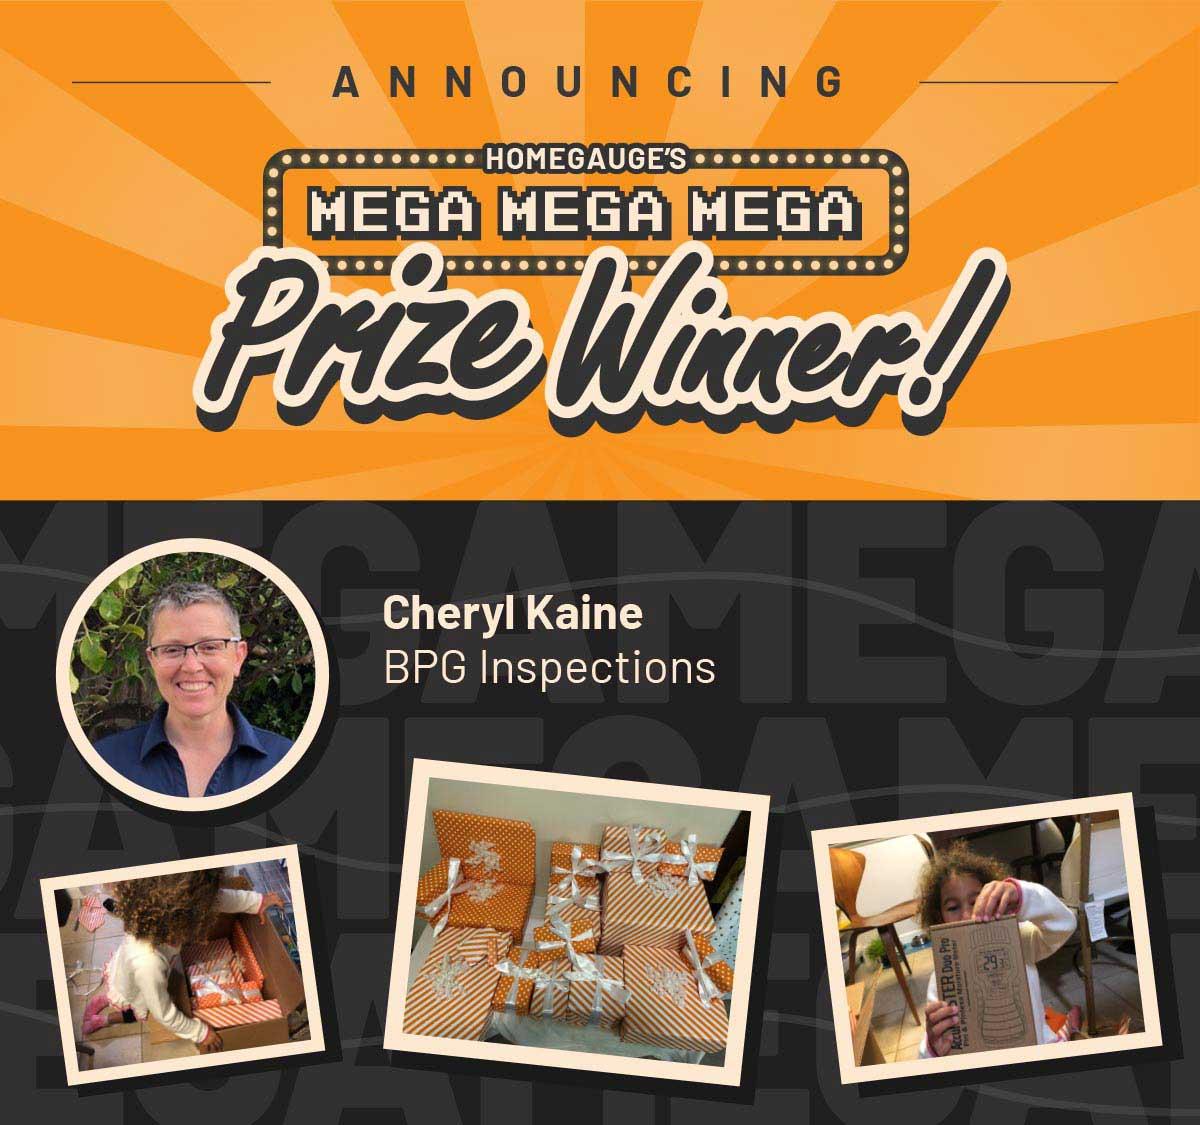 Cyber Monday 2020 Prize Winner